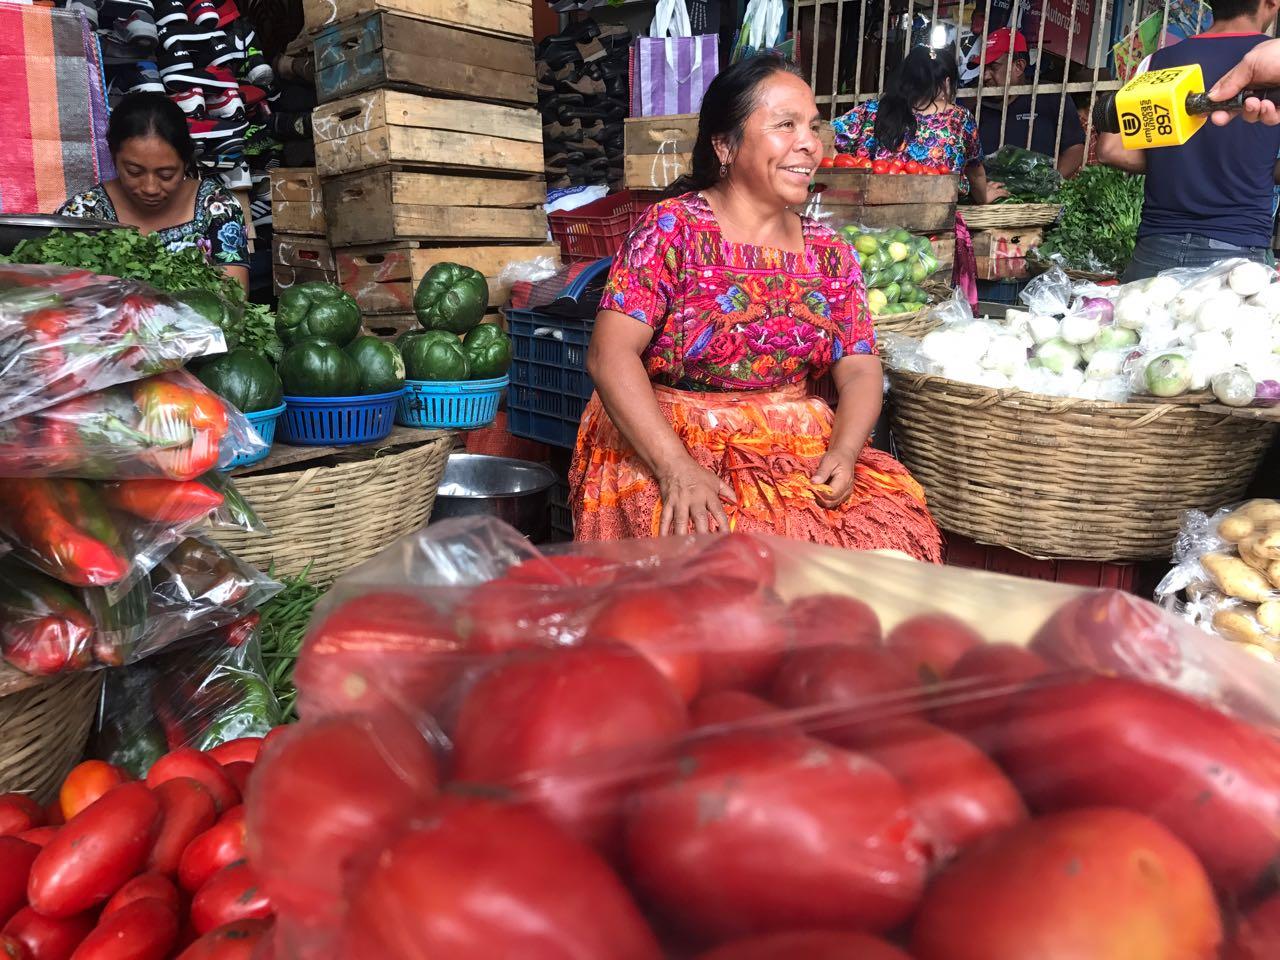 Verduras aumento de precio